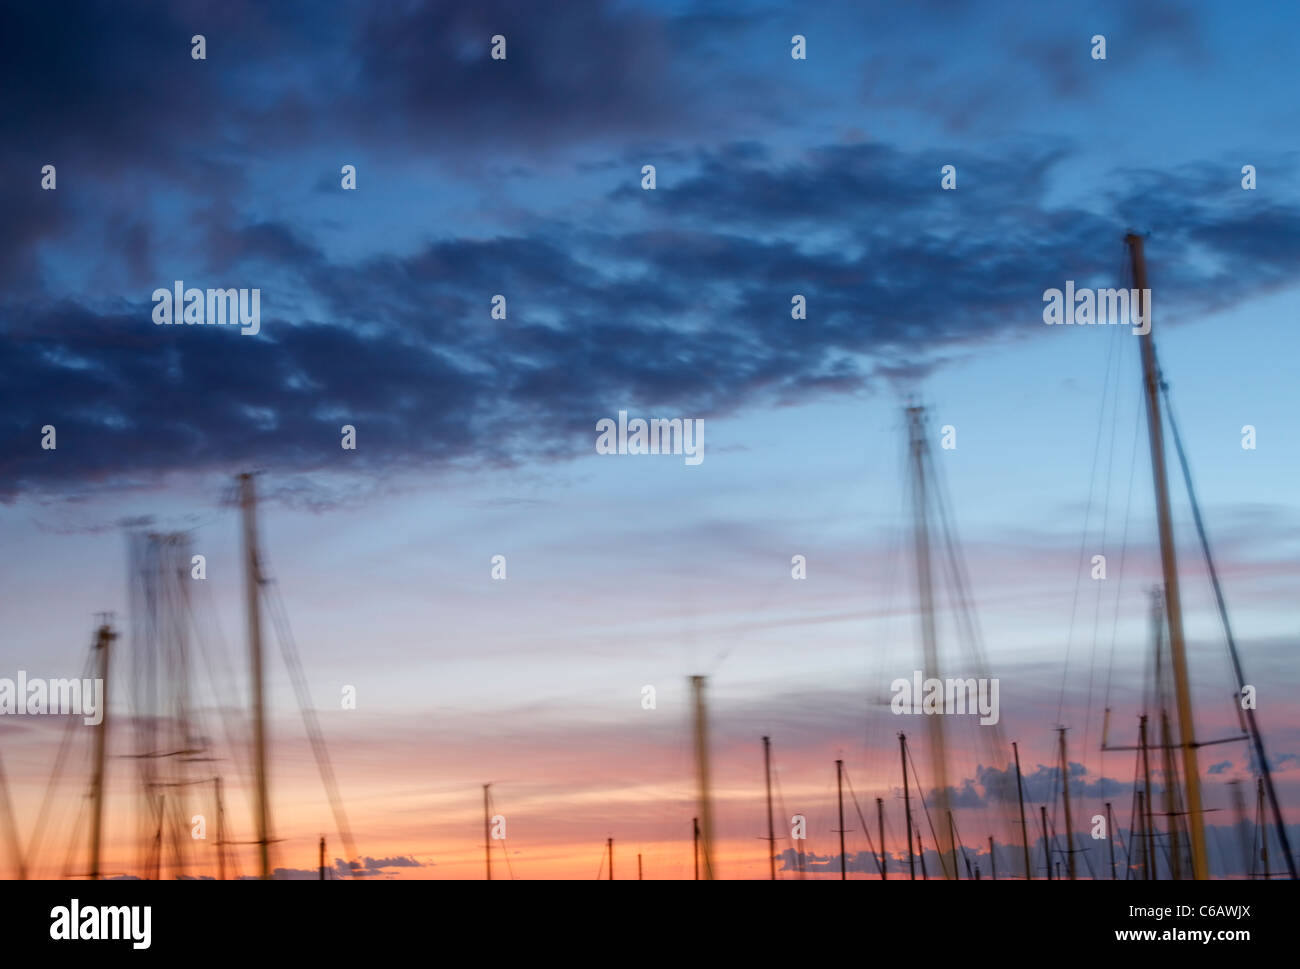 Yacht masts at sunset - Stock Image